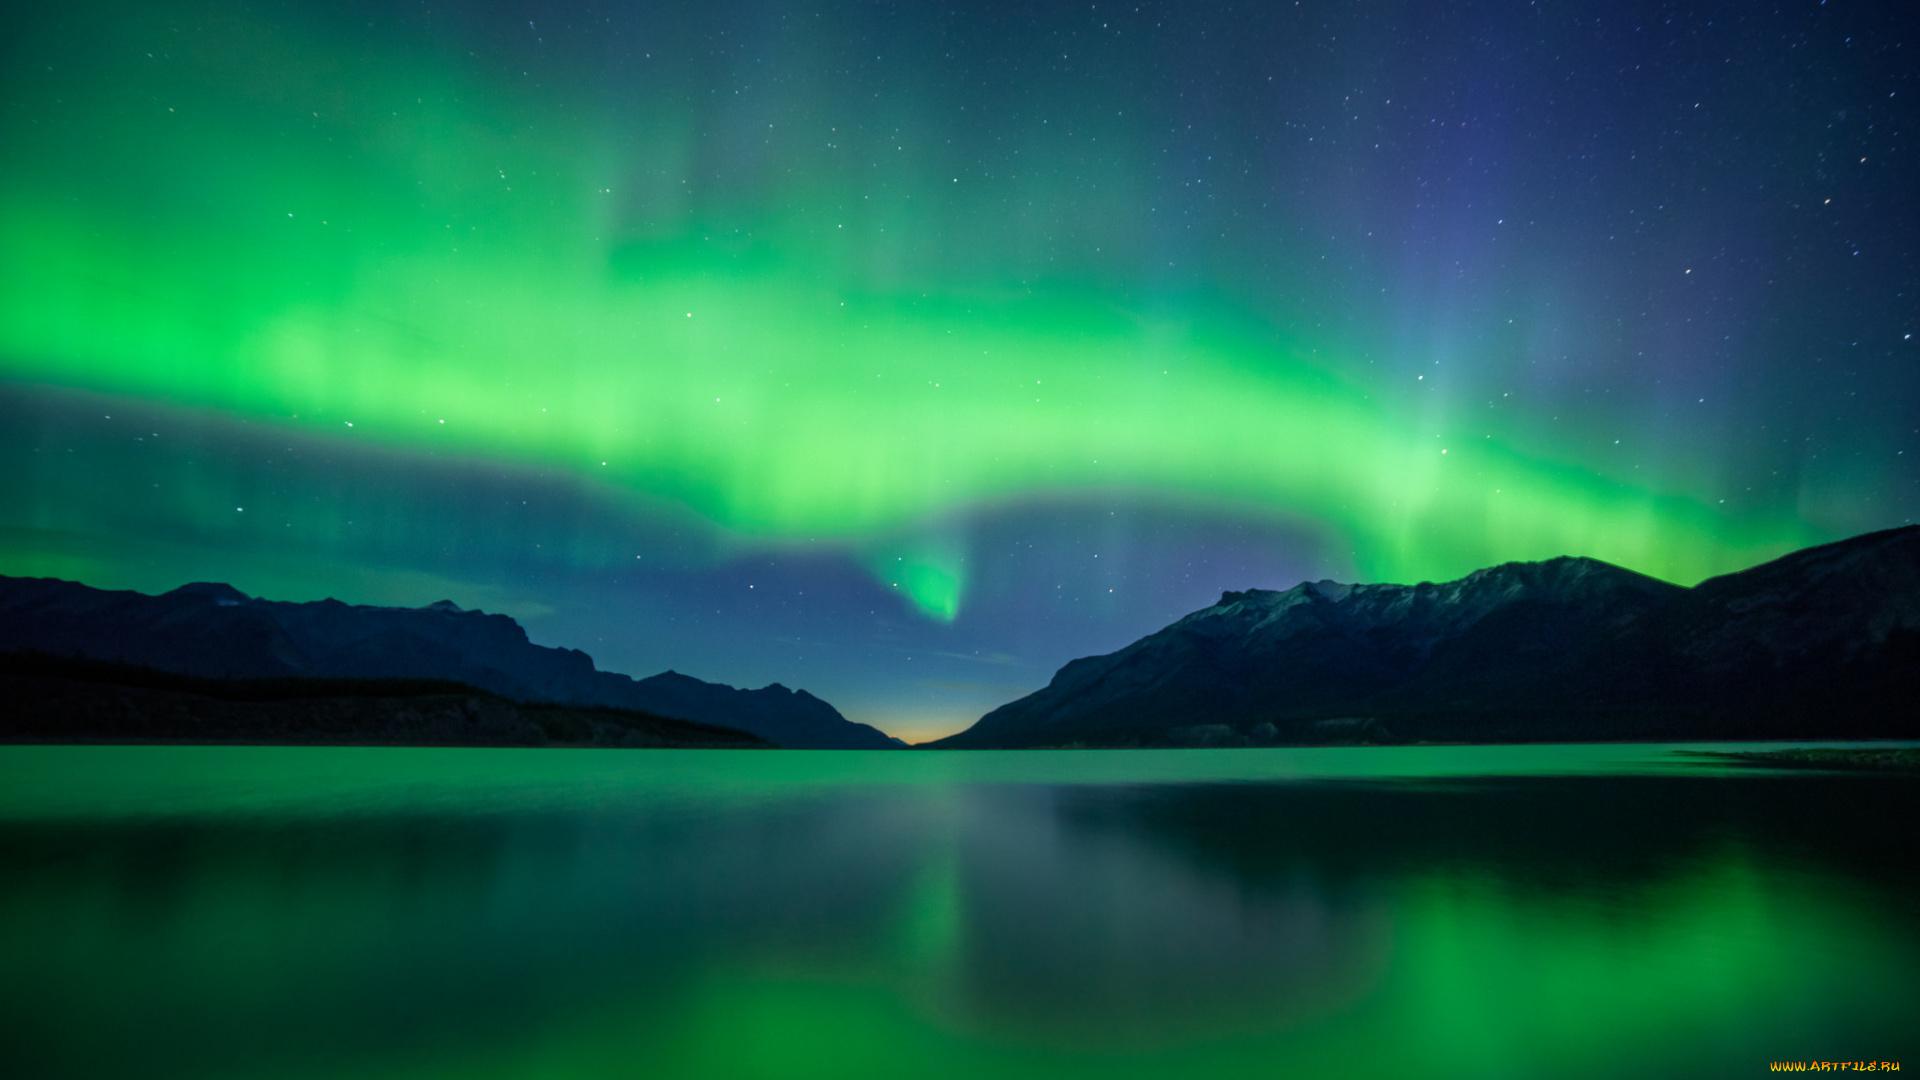 Северное сияние над водой отражение онлайн